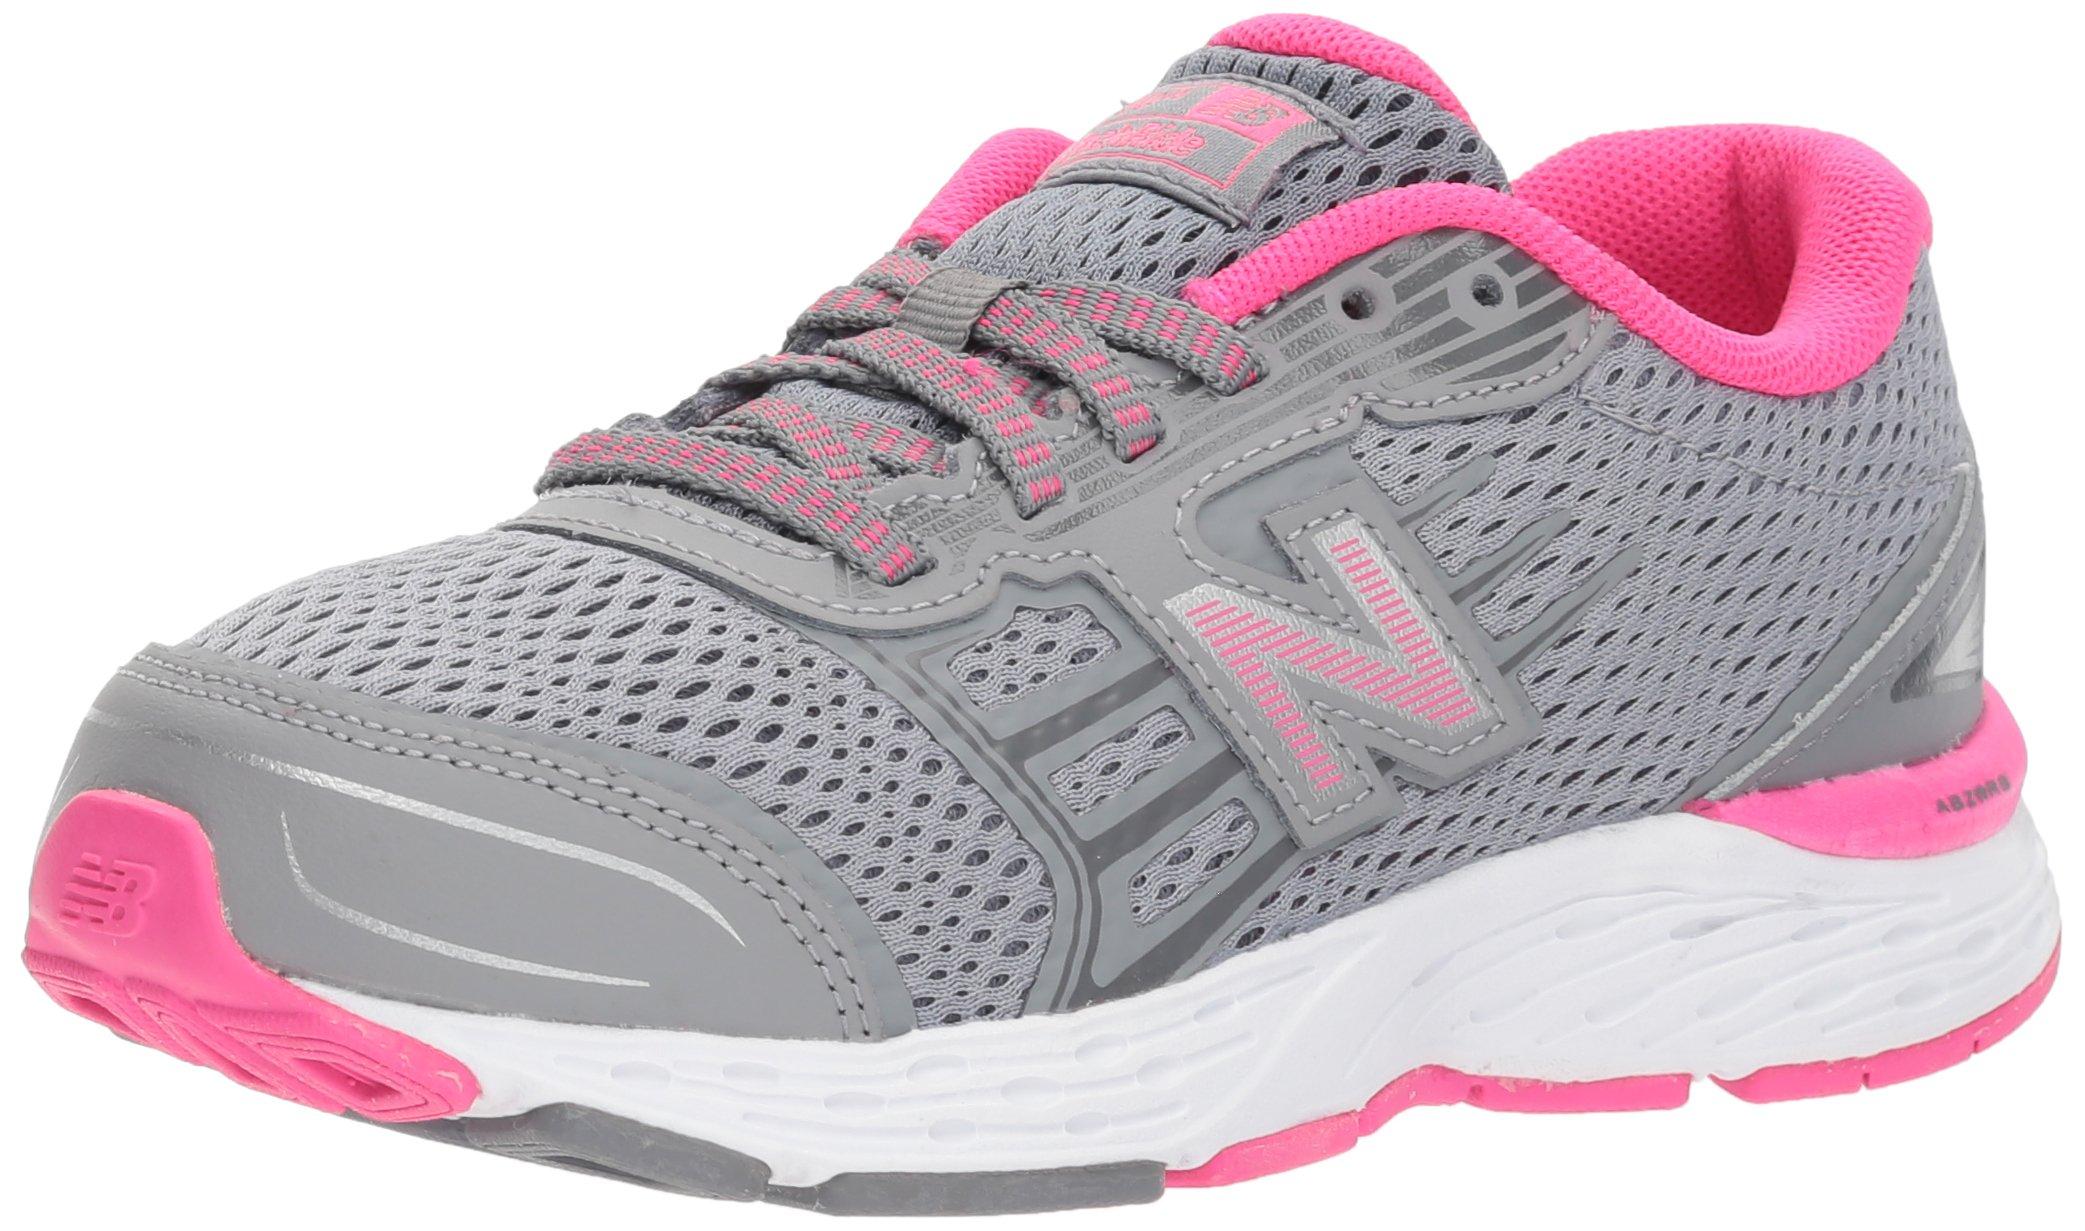 New Balance Girls' 680v5 Running Shoe, Steel/Pink Glo, 2 M US Little Kid